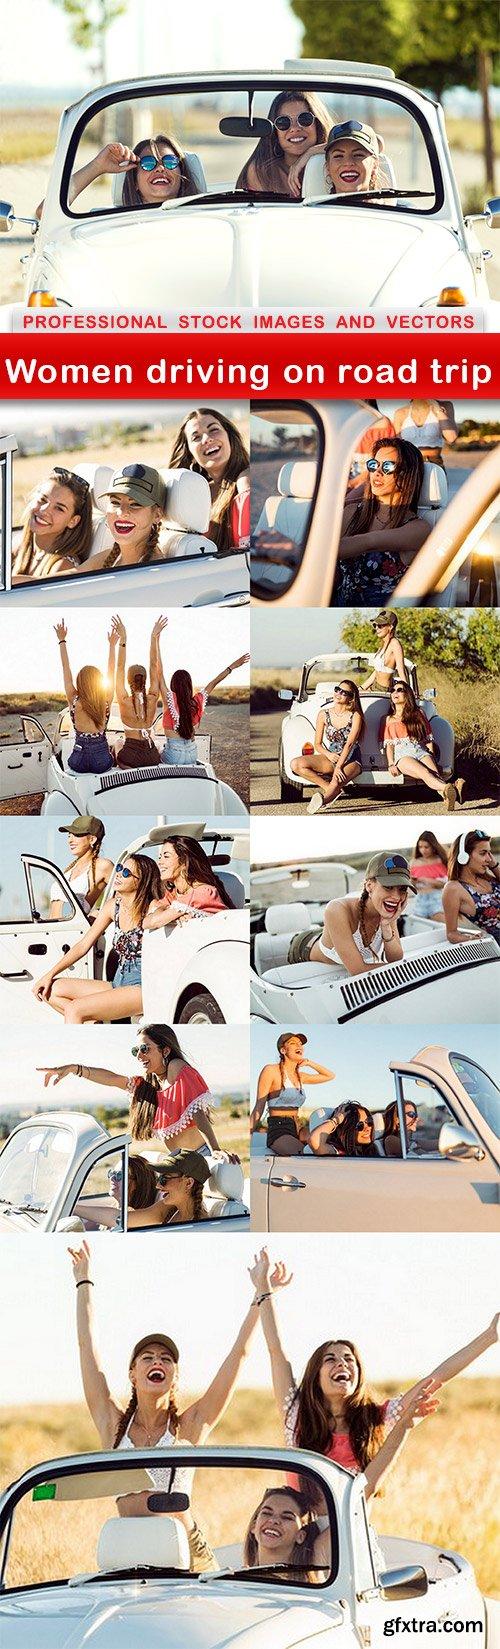 Women driving on road trip - 10 UHQ JPEG